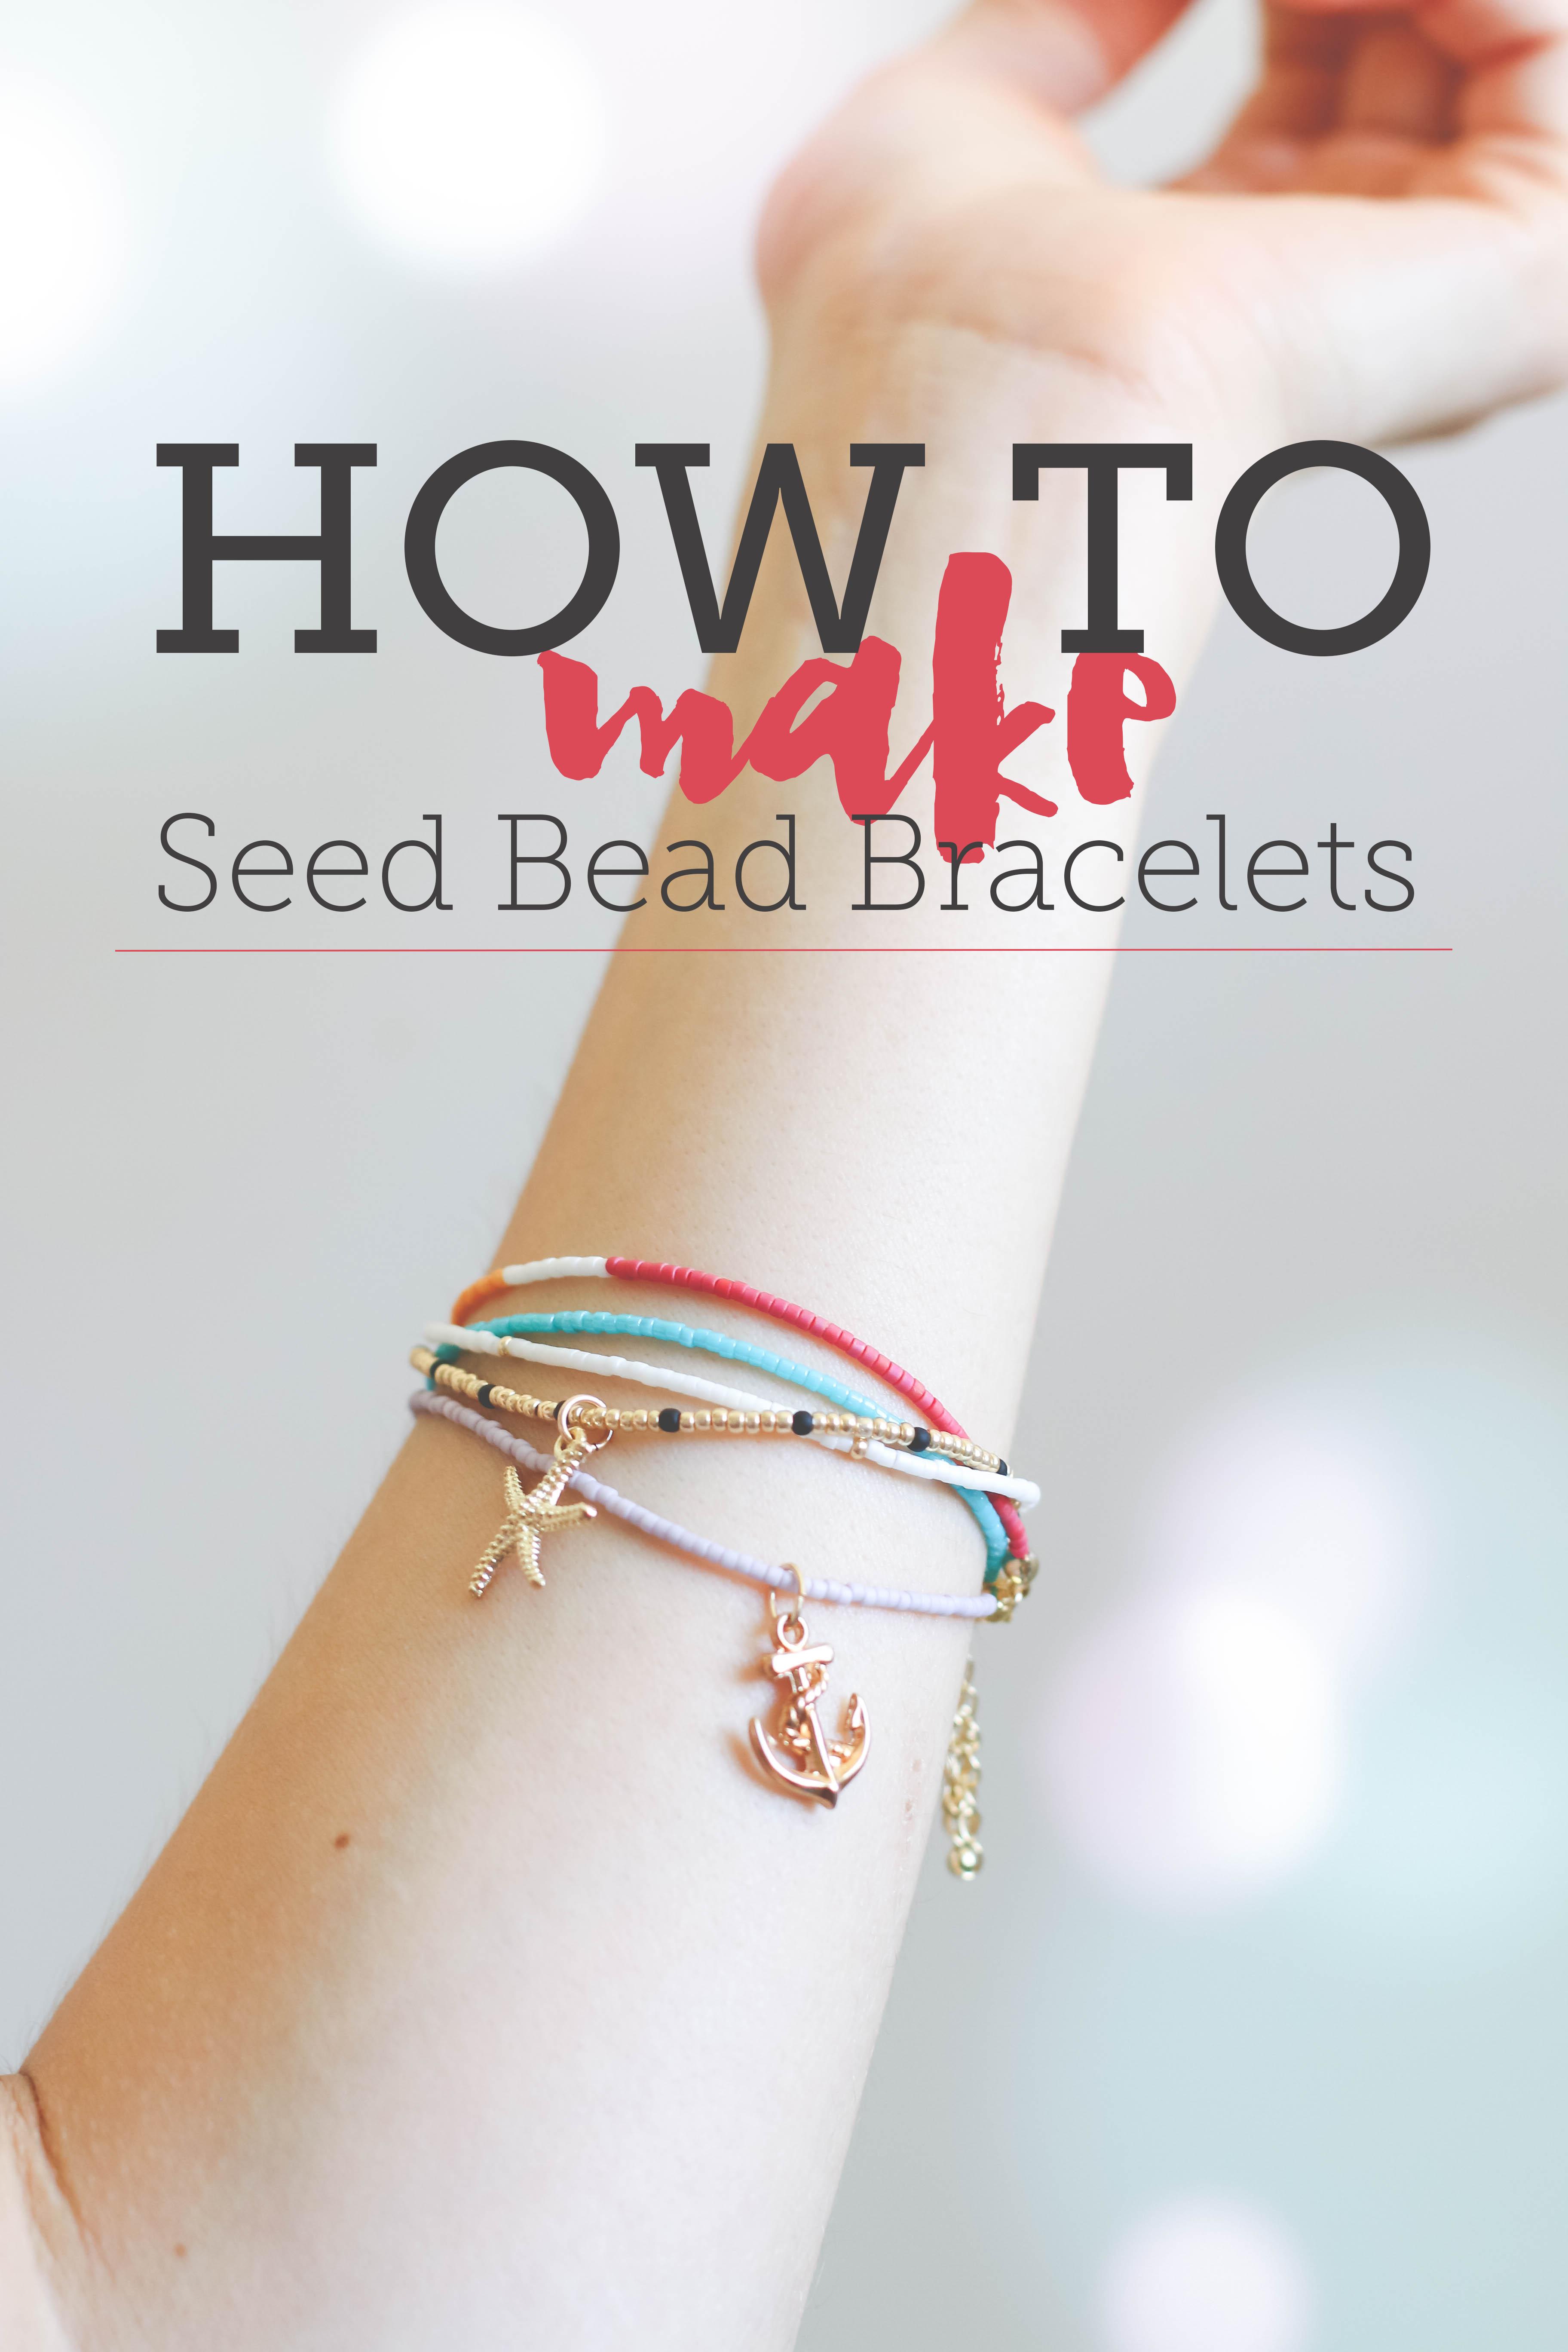 How to Make Seed Bead Bracelets: Free Tutorial